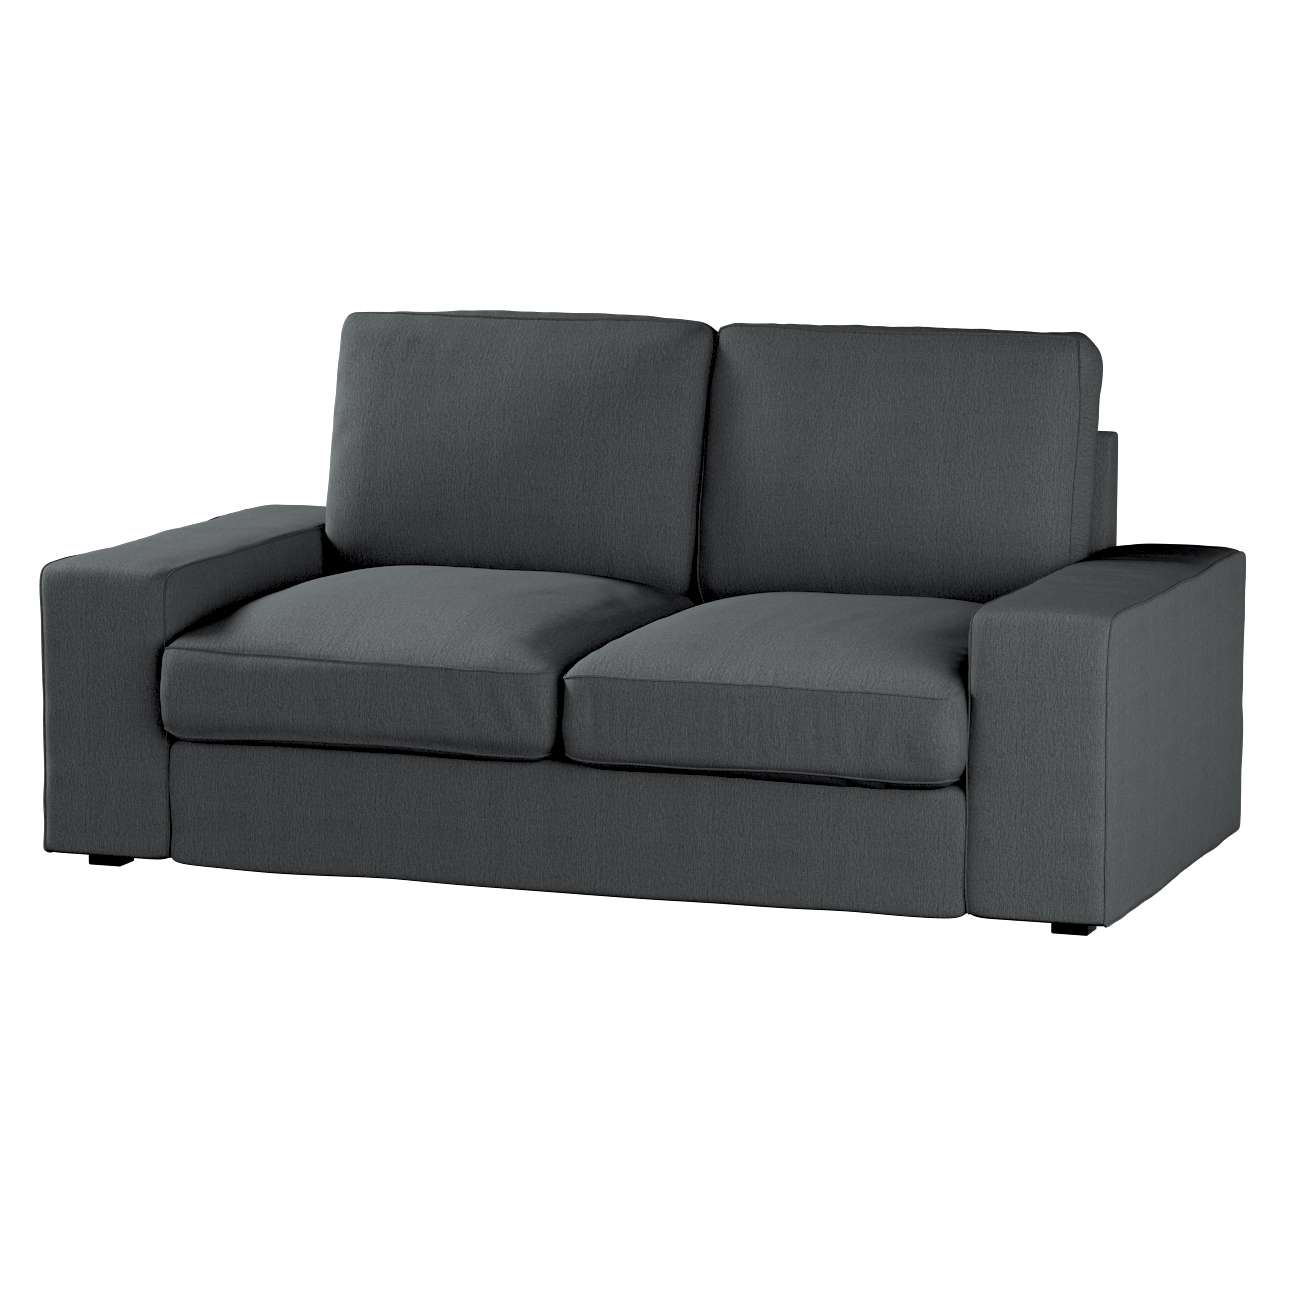 Kivik 2-Sitzer Sofabezug Sofa Kivik 2-Sitzer von der Kollektion Chenille , Stoff: 702-20